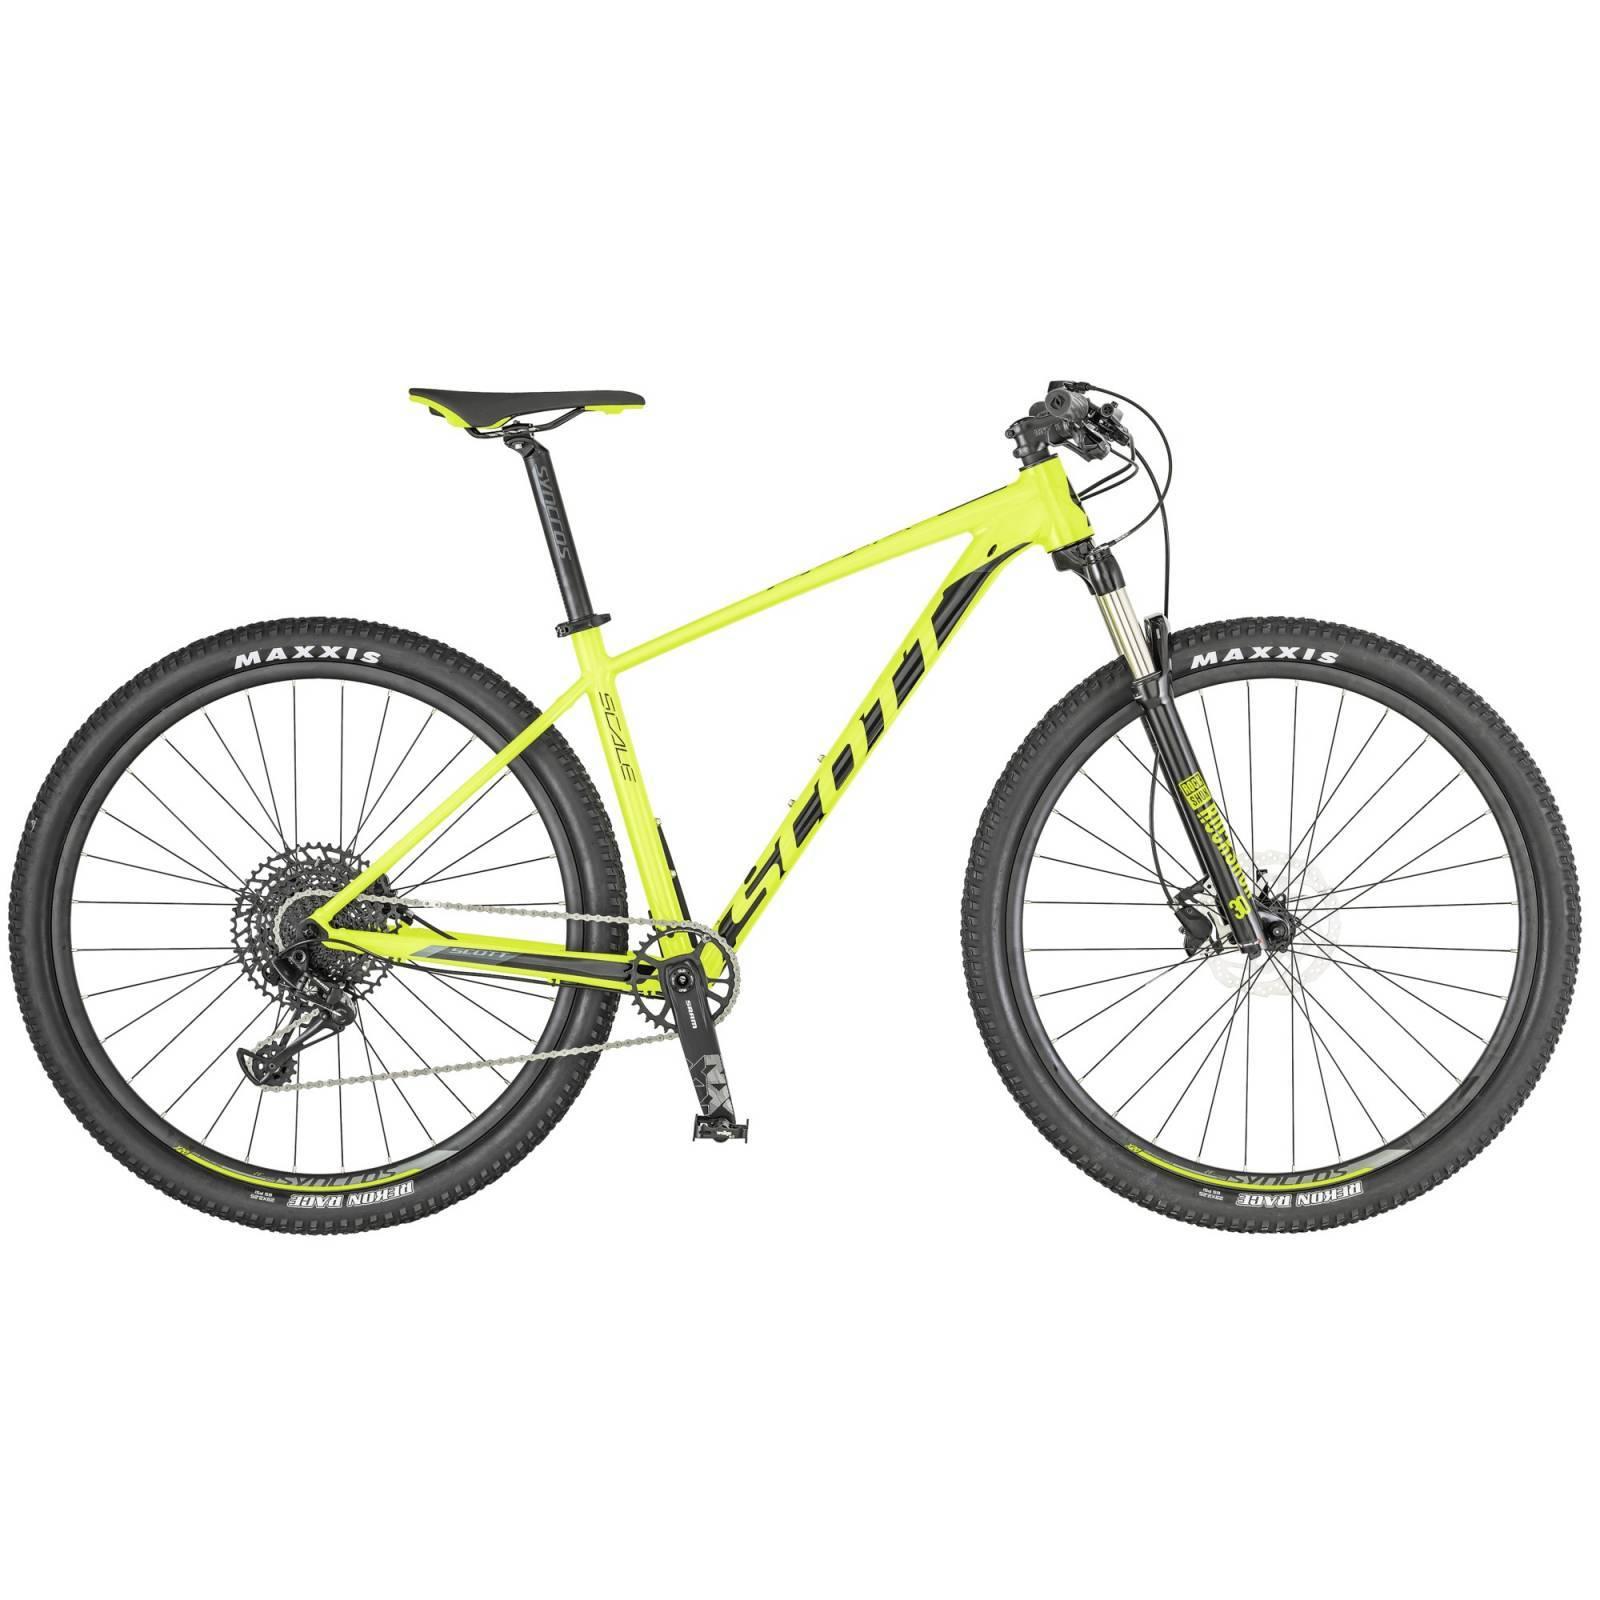 Bicicleta Scott Scale 980 2019 A - Alex Ribeiro Bikes